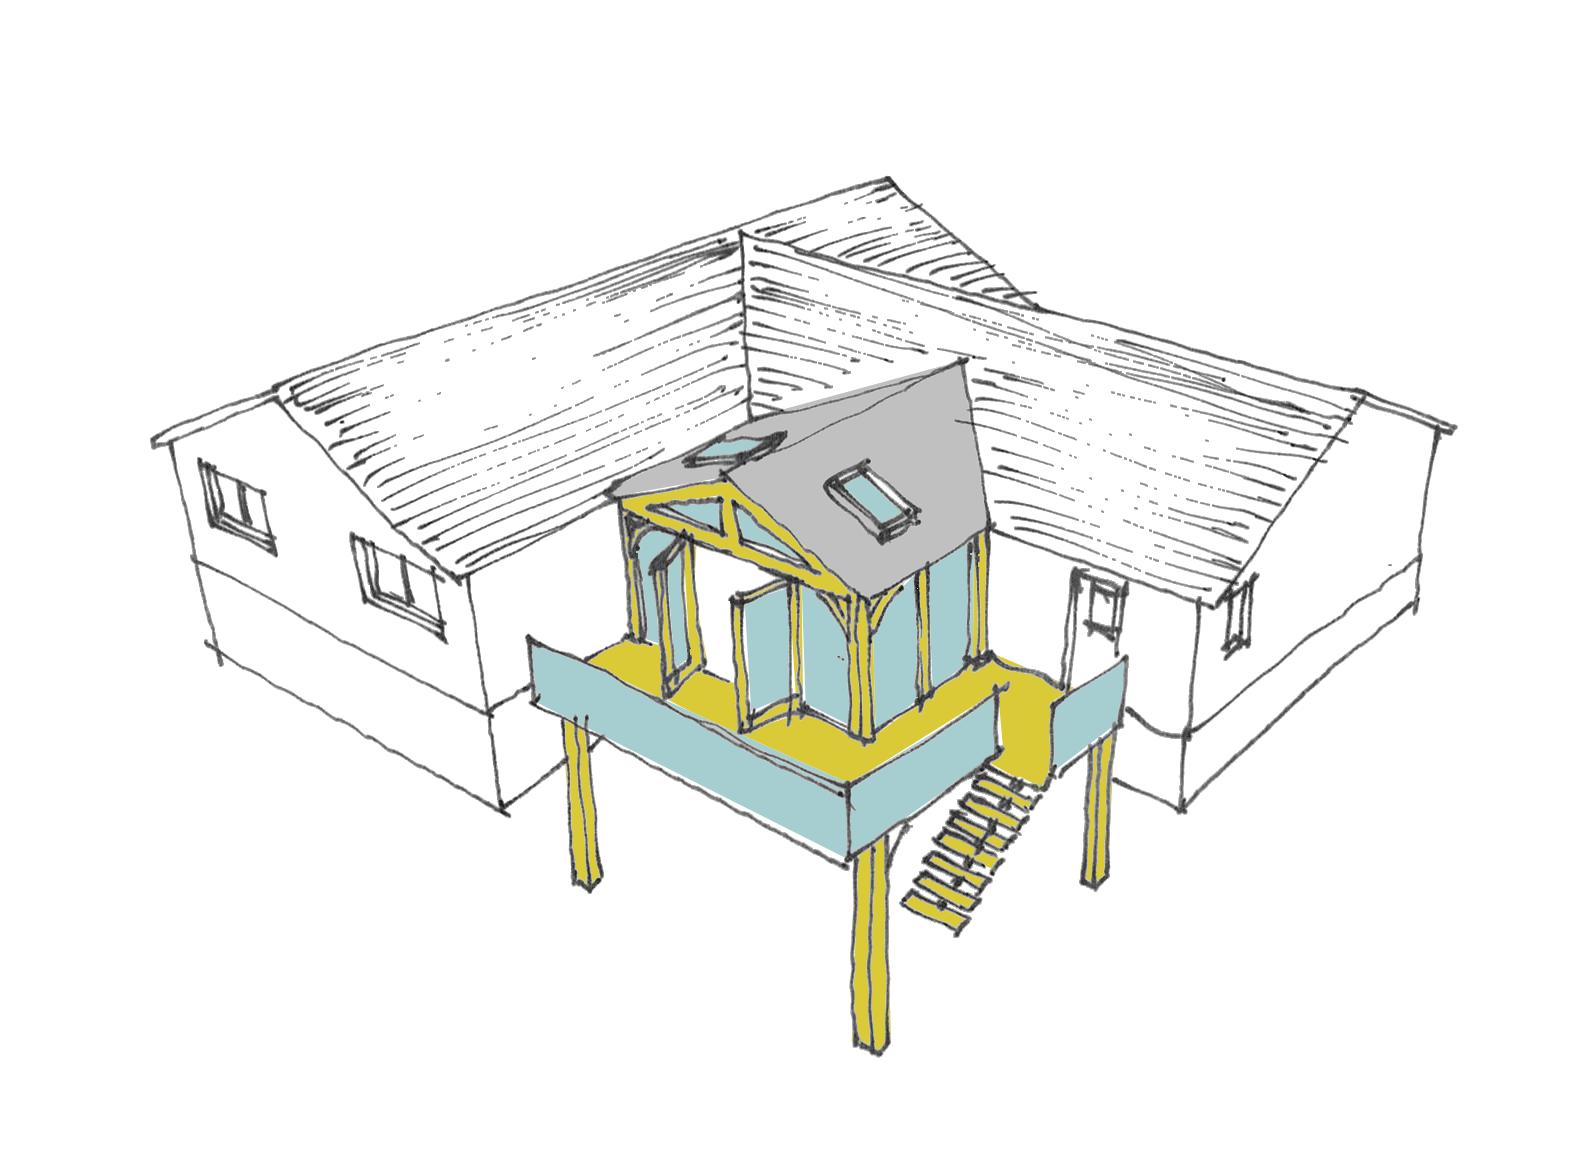 'Oak' extension - part of the feasibility design option